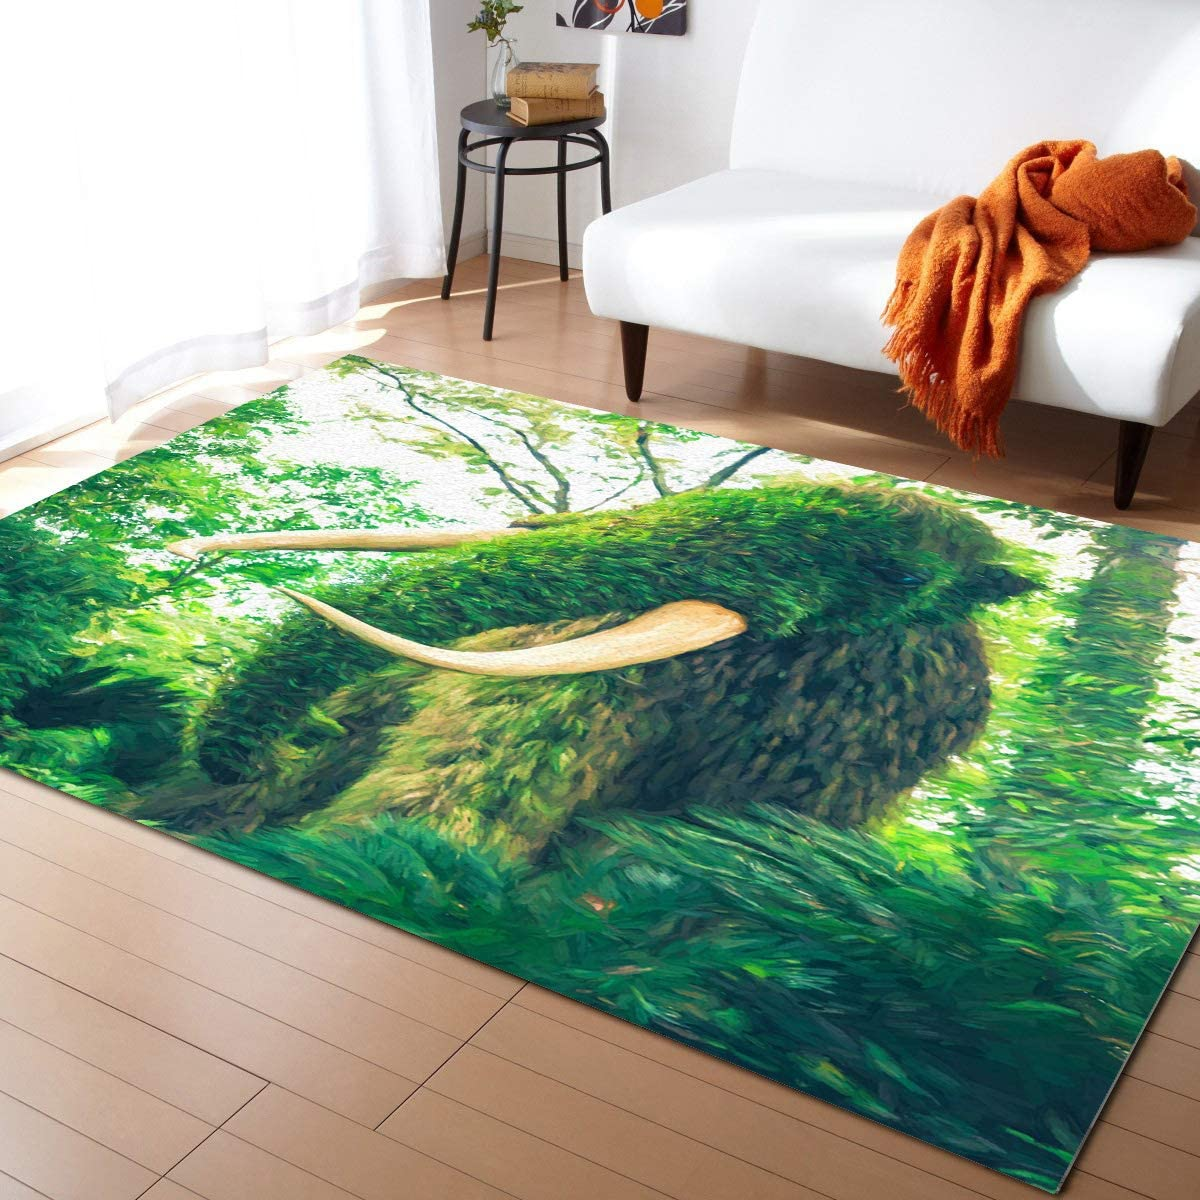 Caffling Modern Area Rugs for Living Room Las Vegas Mall Mammot Leafy Feet 3x5 2021